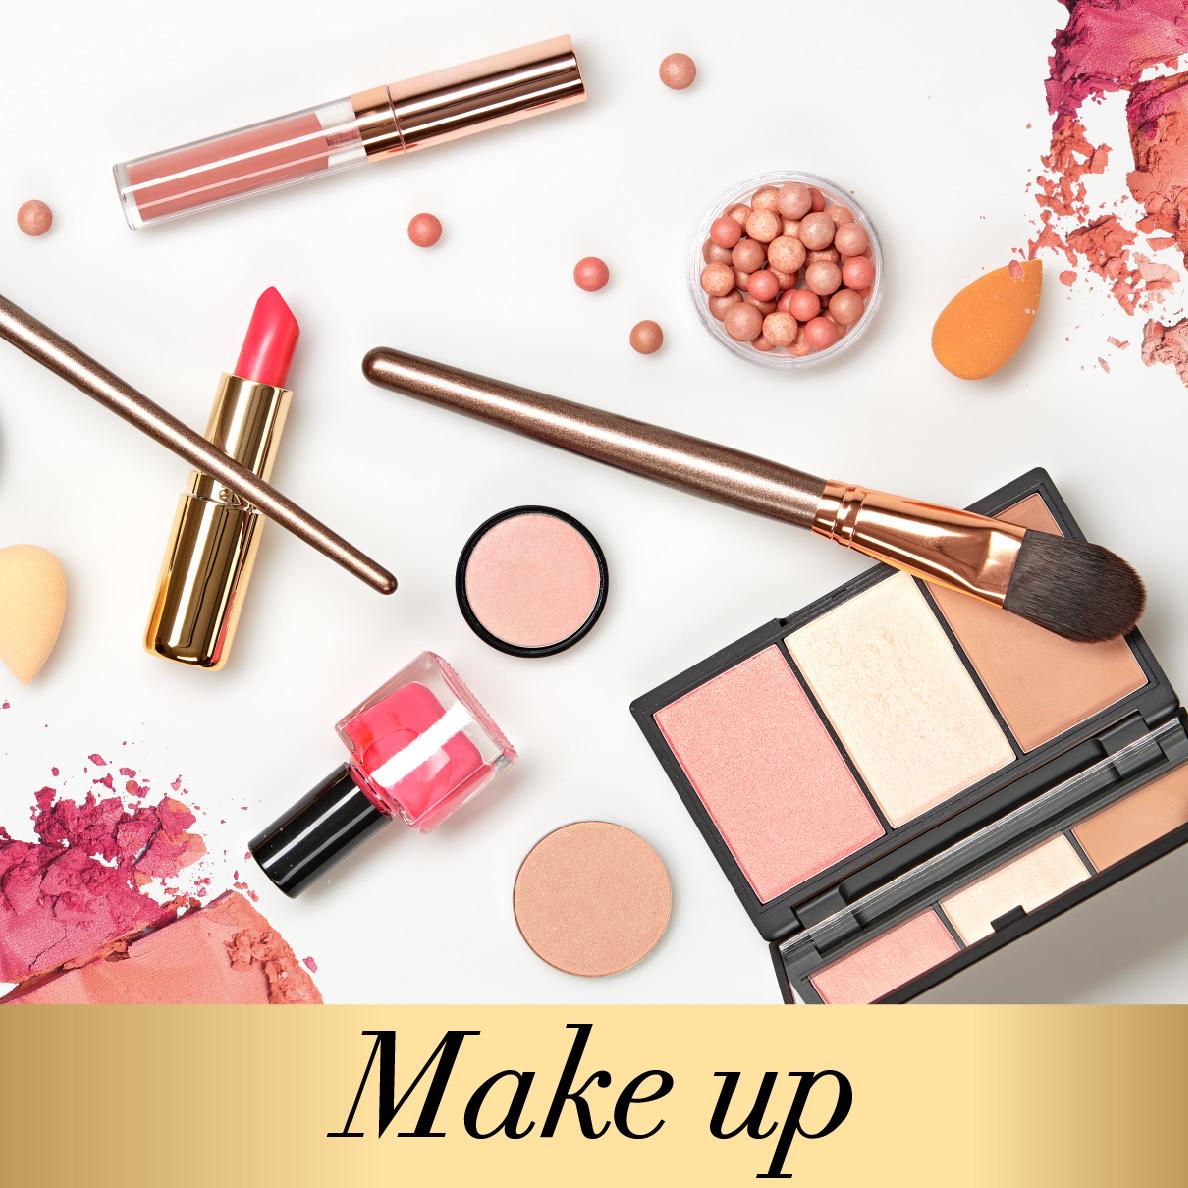 Make-up-570×570-1_1188x1188_acf_cropped